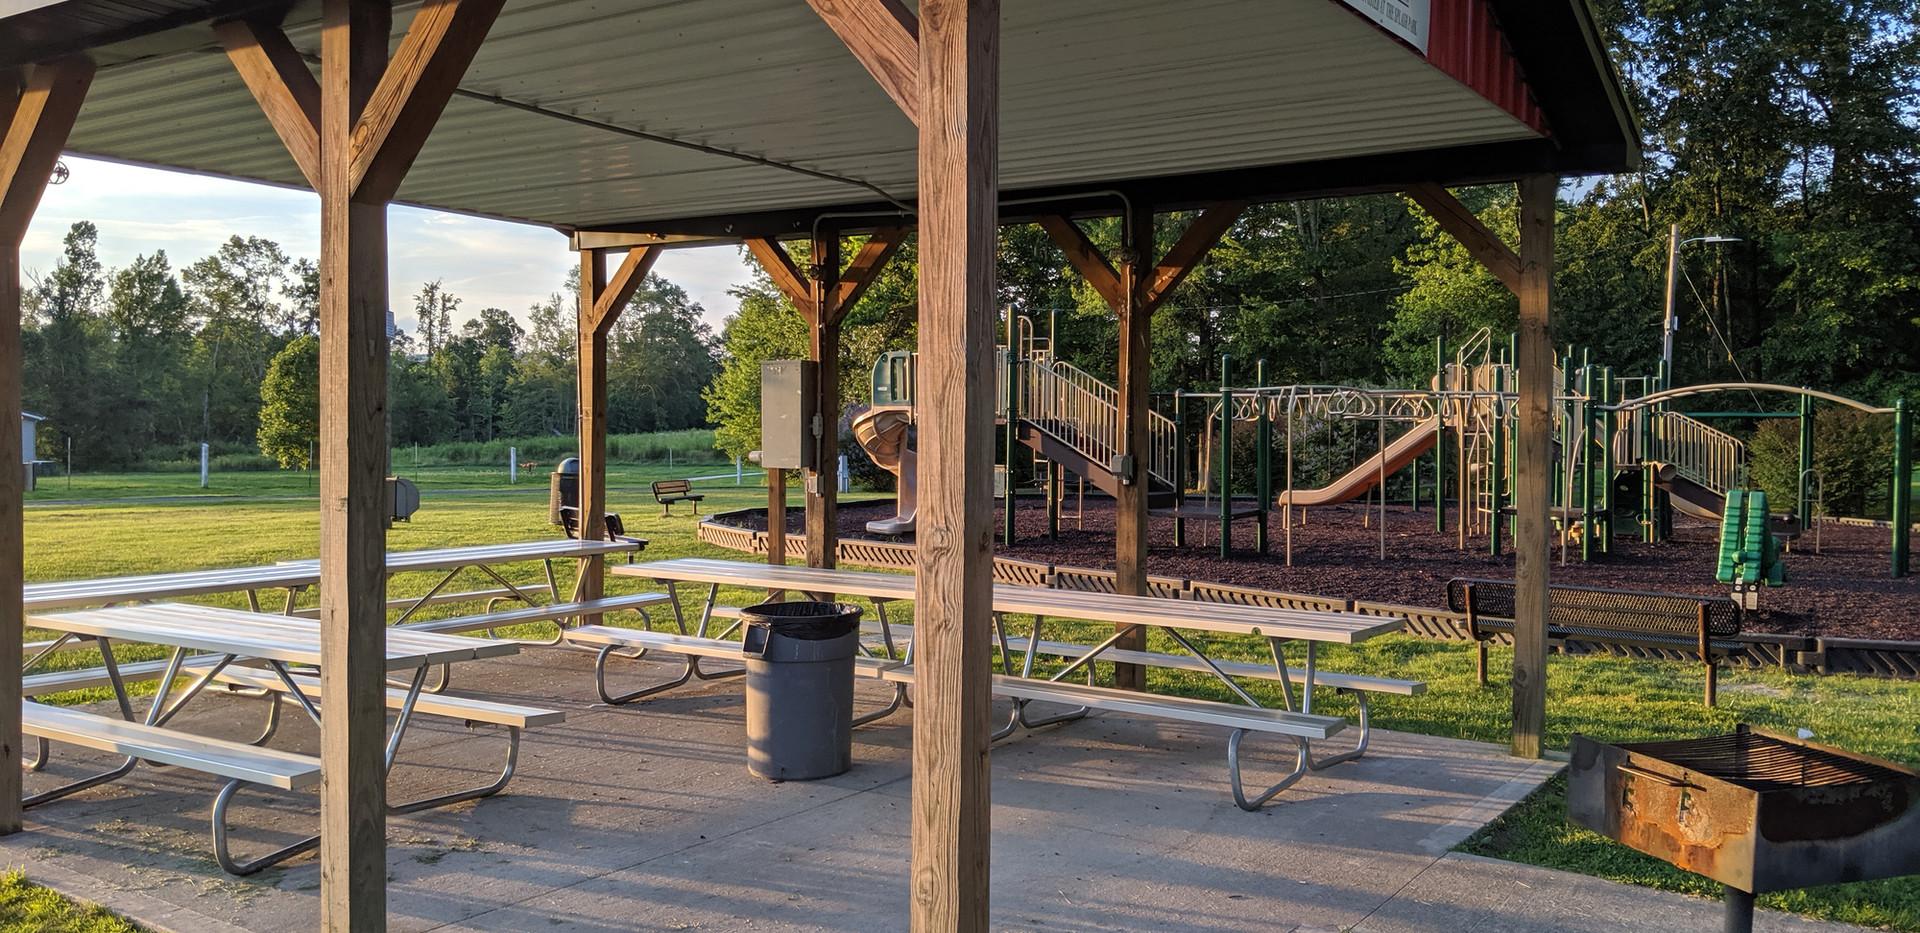 The Big Green Playground Pavilion